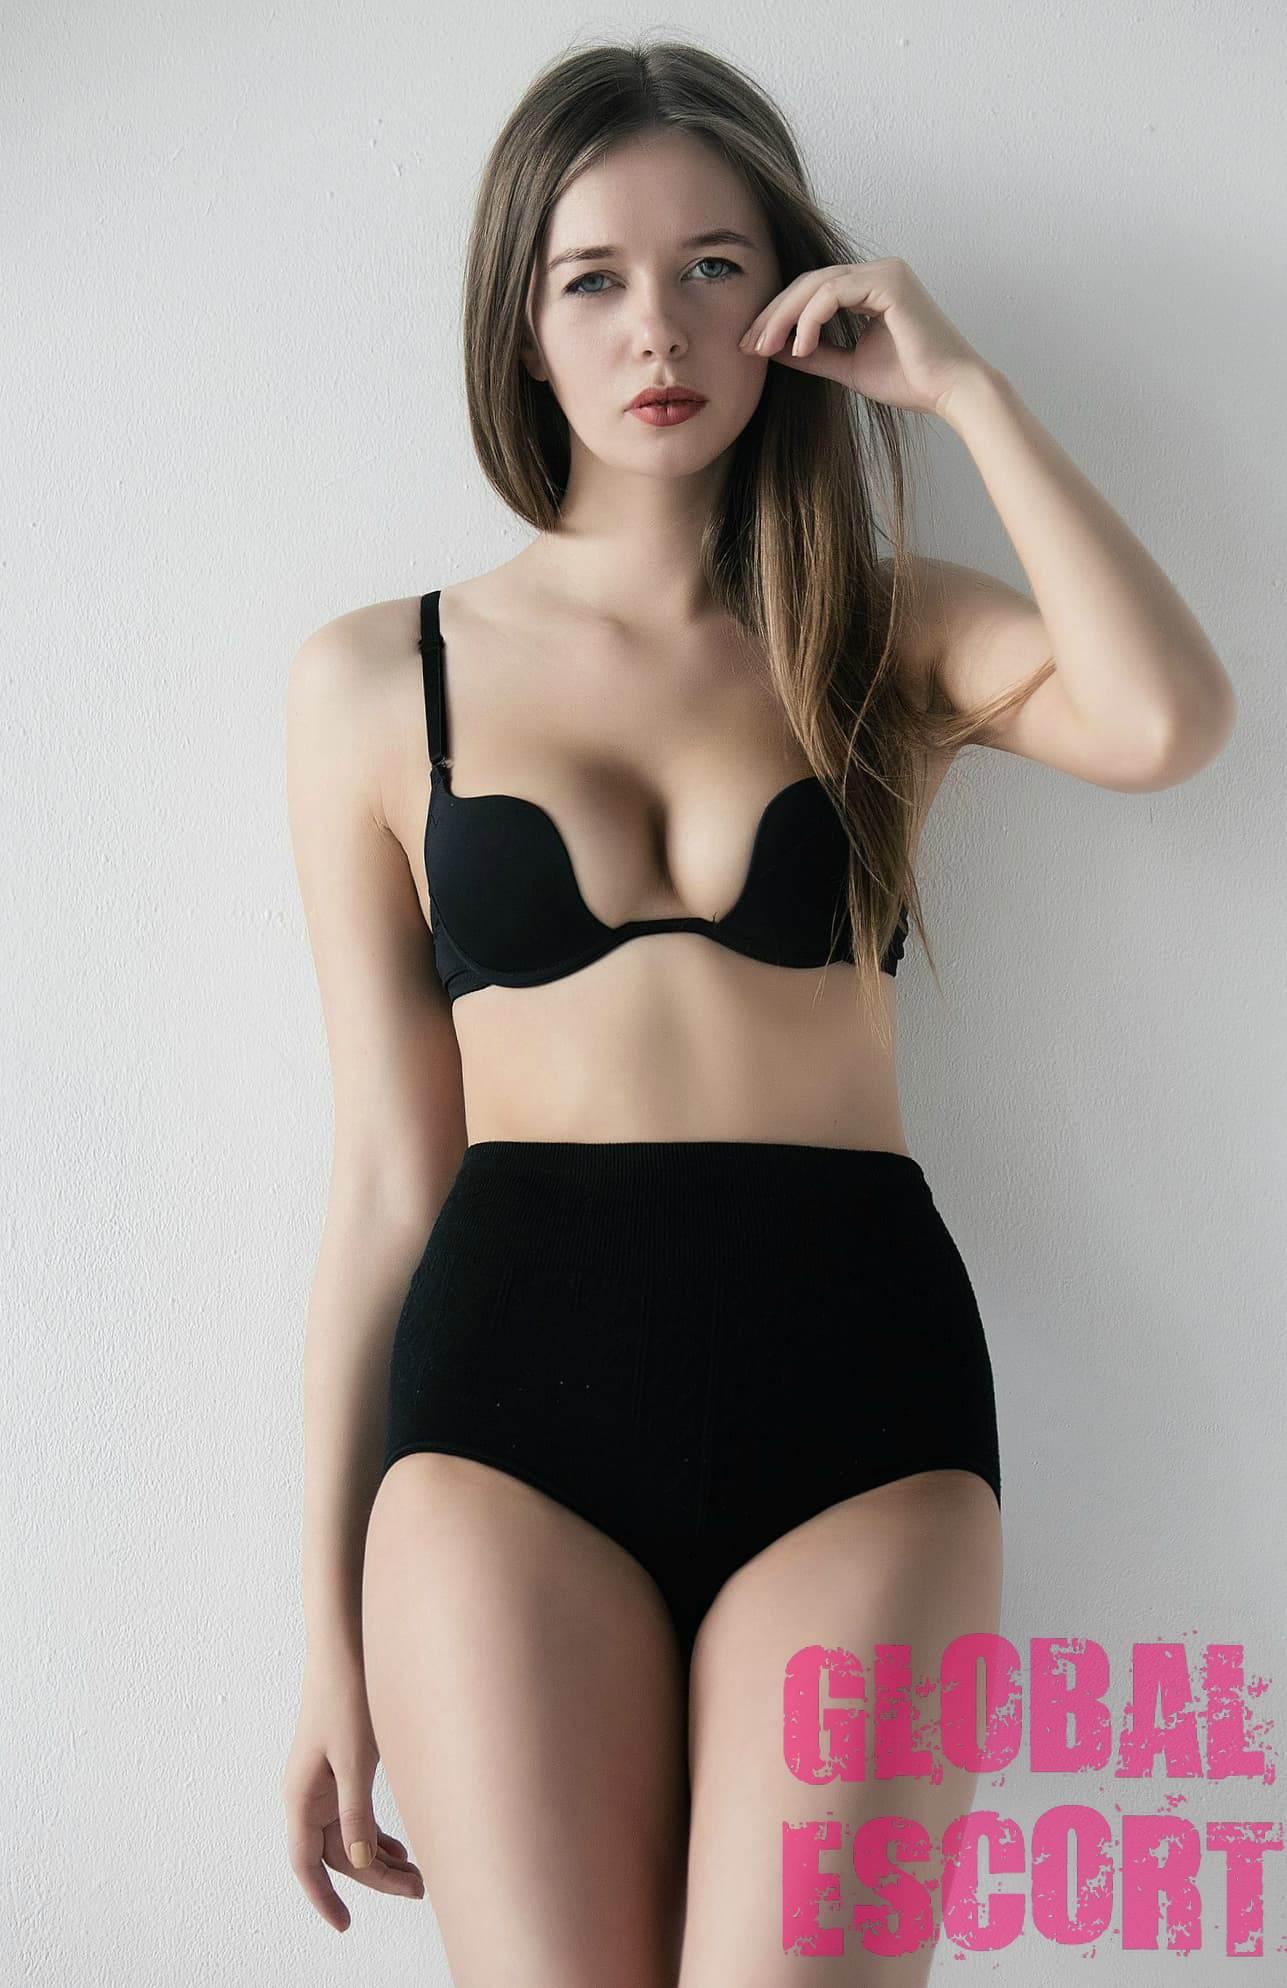 escort model Svetlana in black lingerie posing at a photo shoot